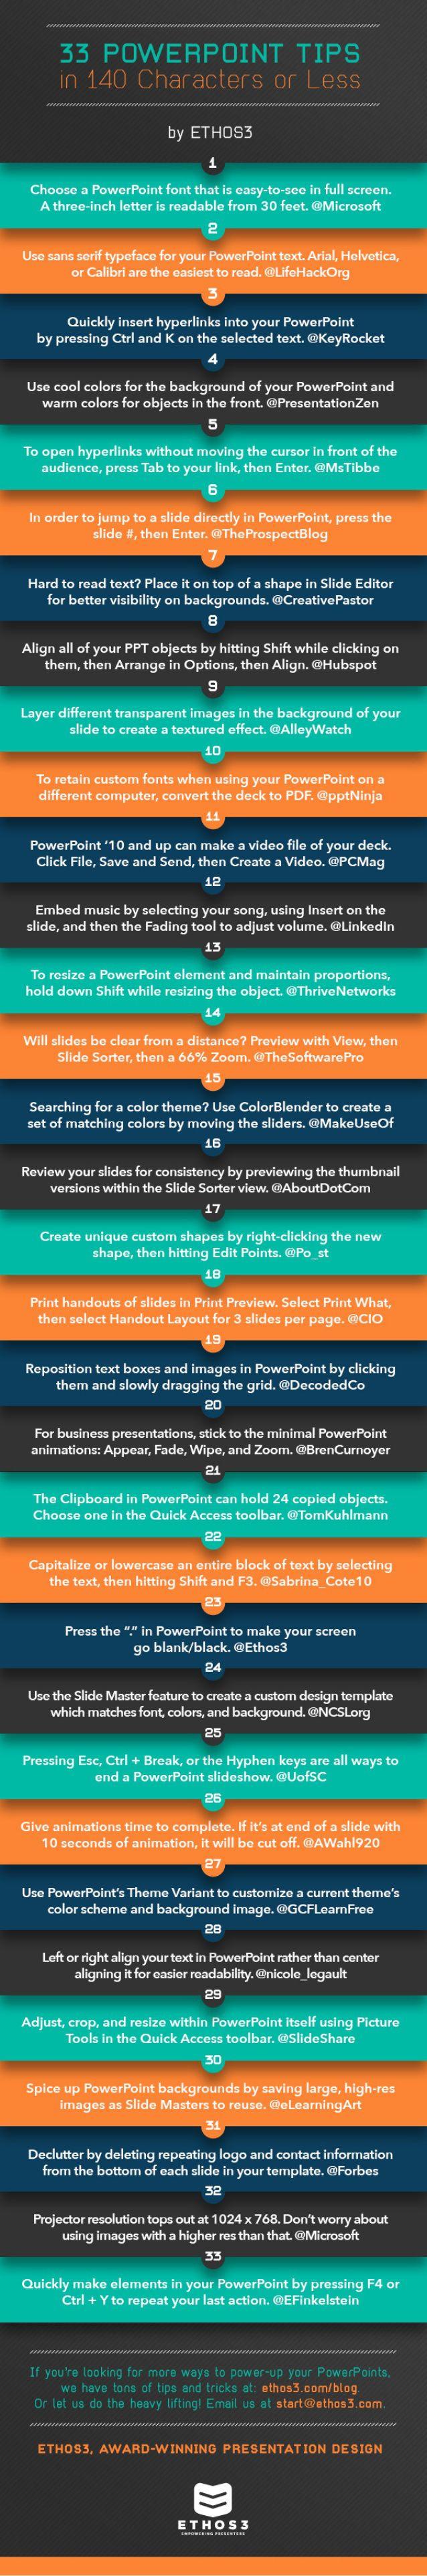 33 consejos sobre PowerPoint en 140 caracteres #infografia #infographic